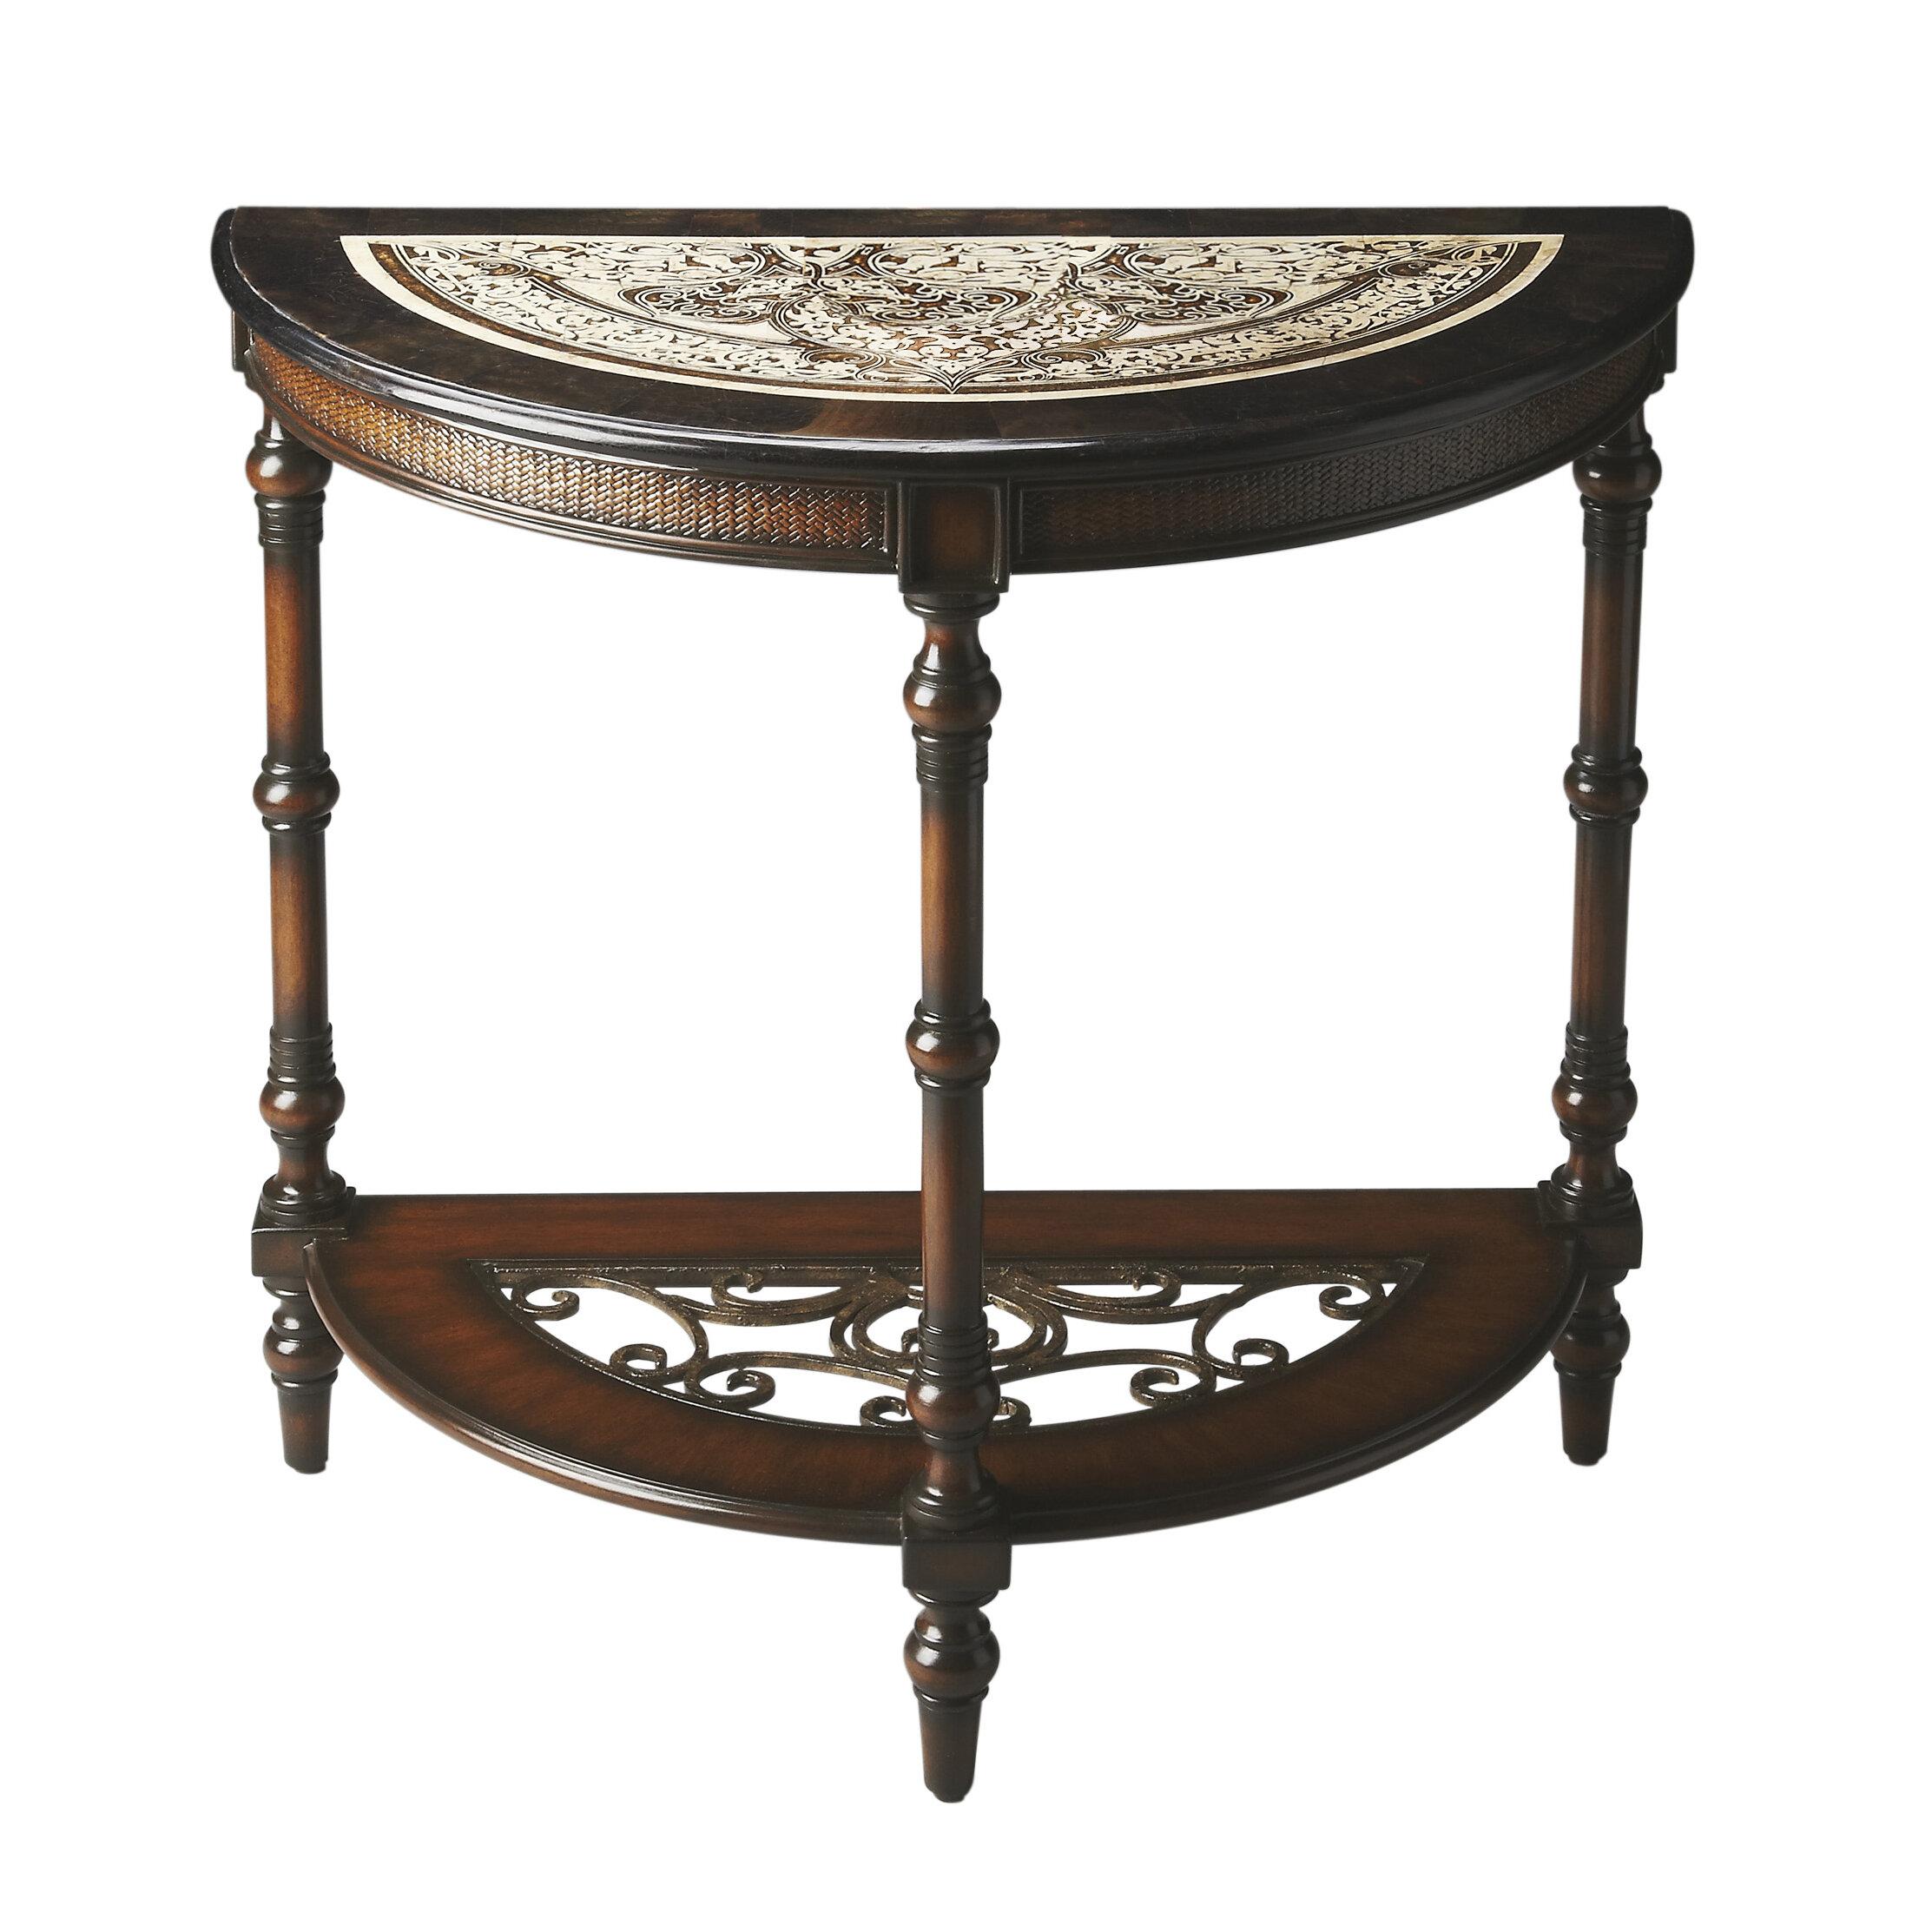 Outstanding Salgado Demilune Console Table Spiritservingveterans Wood Chair Design Ideas Spiritservingveteransorg